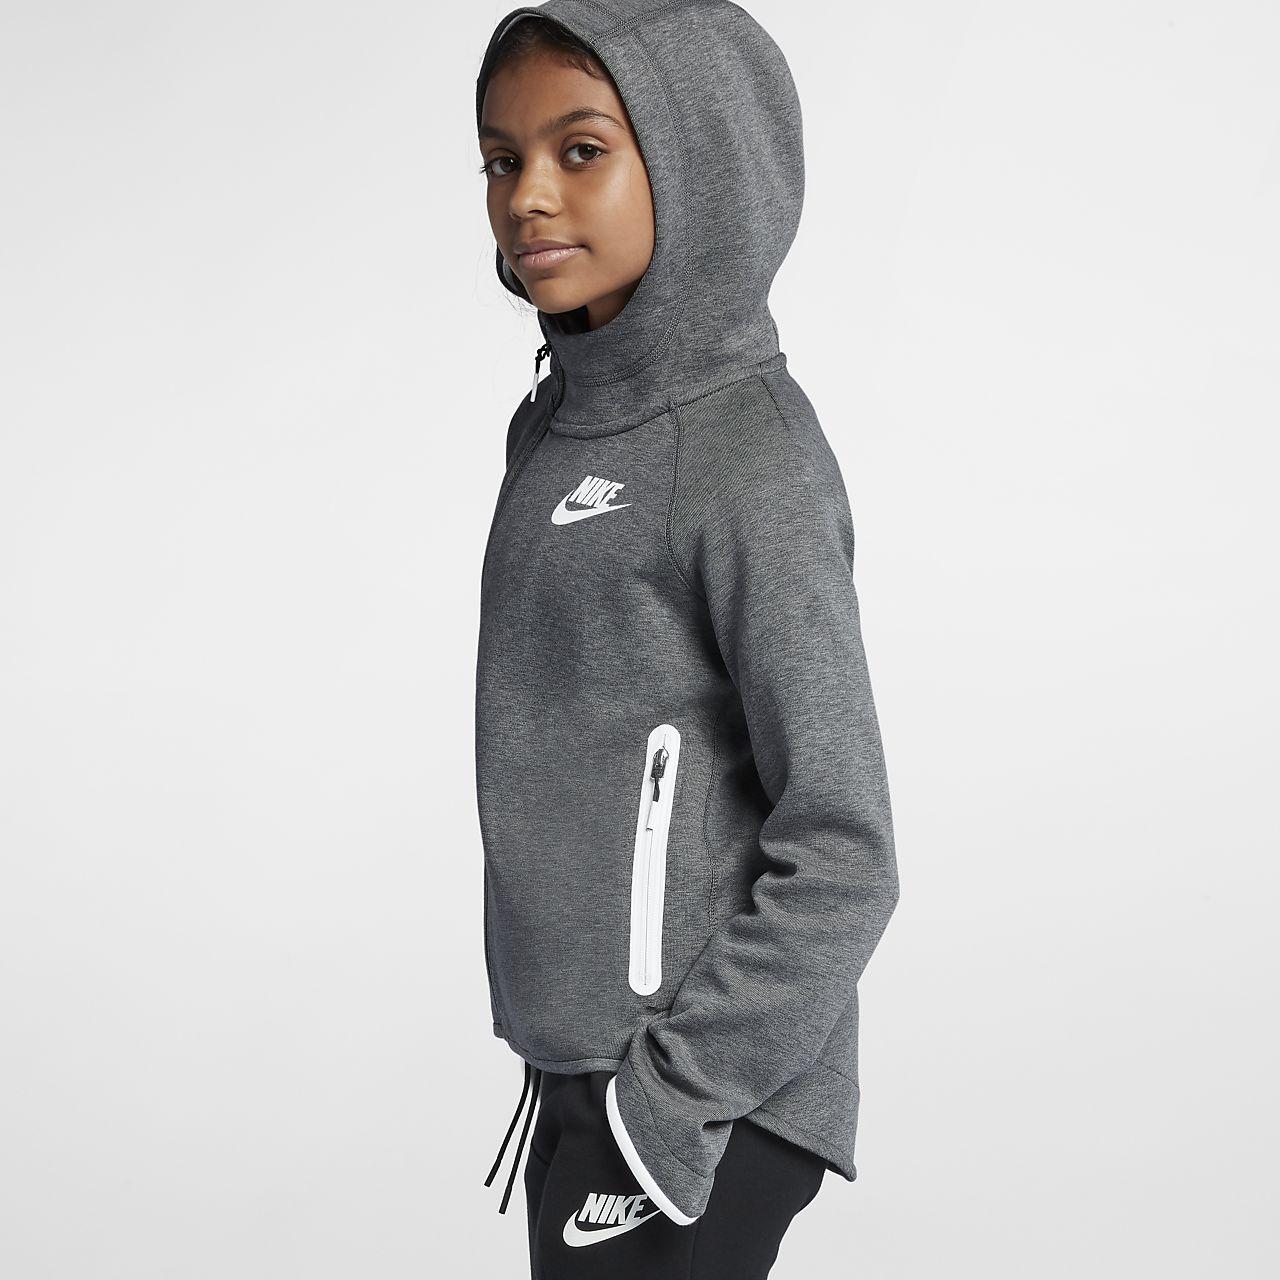 e89486a40a5 Nike Sportswear Tech Fleece Big Kids  (Girls ) Full-Zip Hoodie. Nike.com